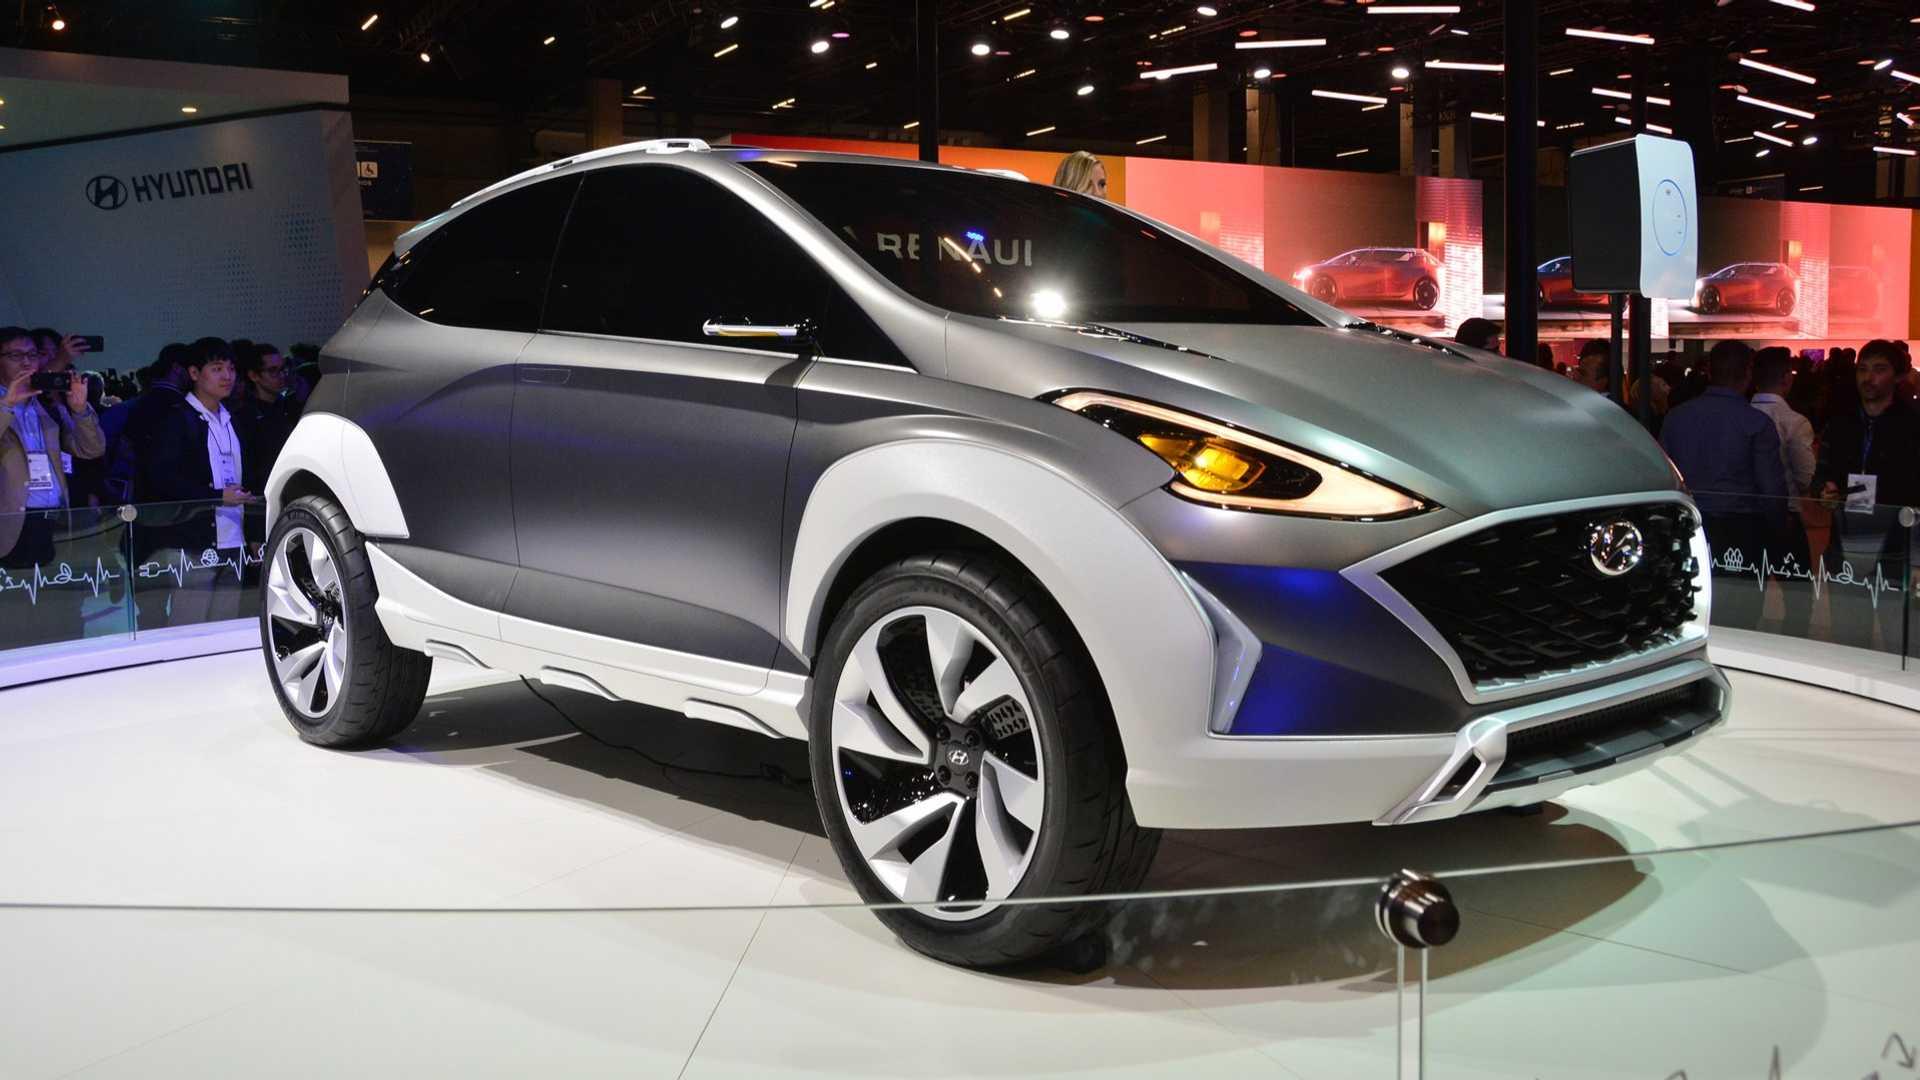 Концепт Hyundai Saga EV намекнул на выход нового кросс-хэтча